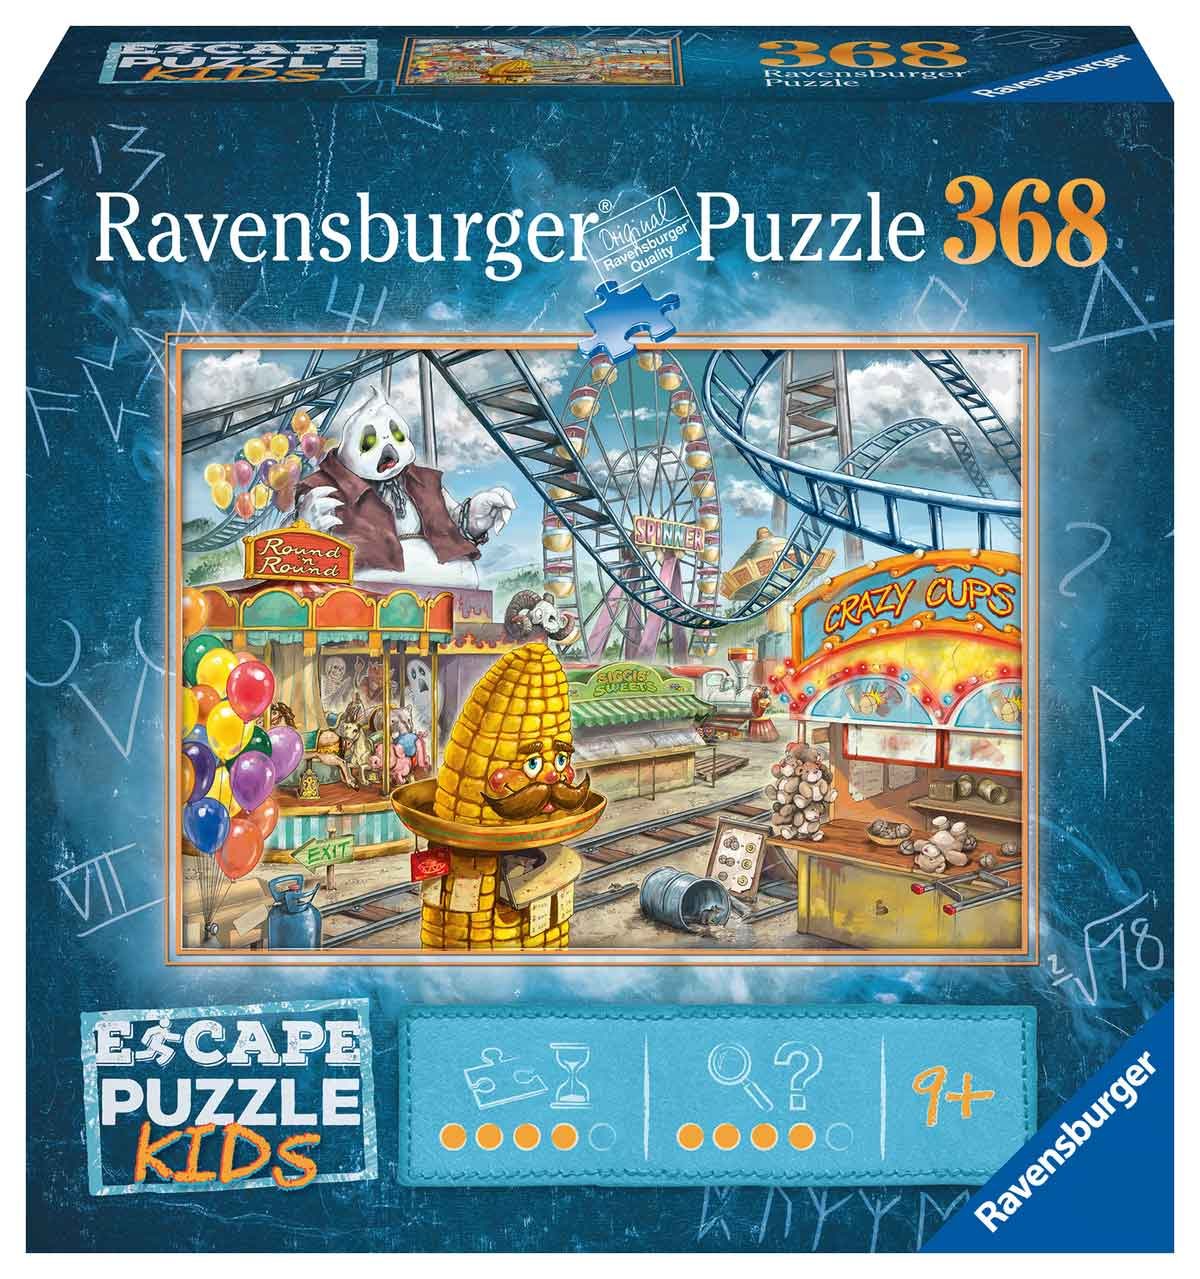 Puzzle Escape Kids Ravensburger Parque de Atracciones de 368 Pzs